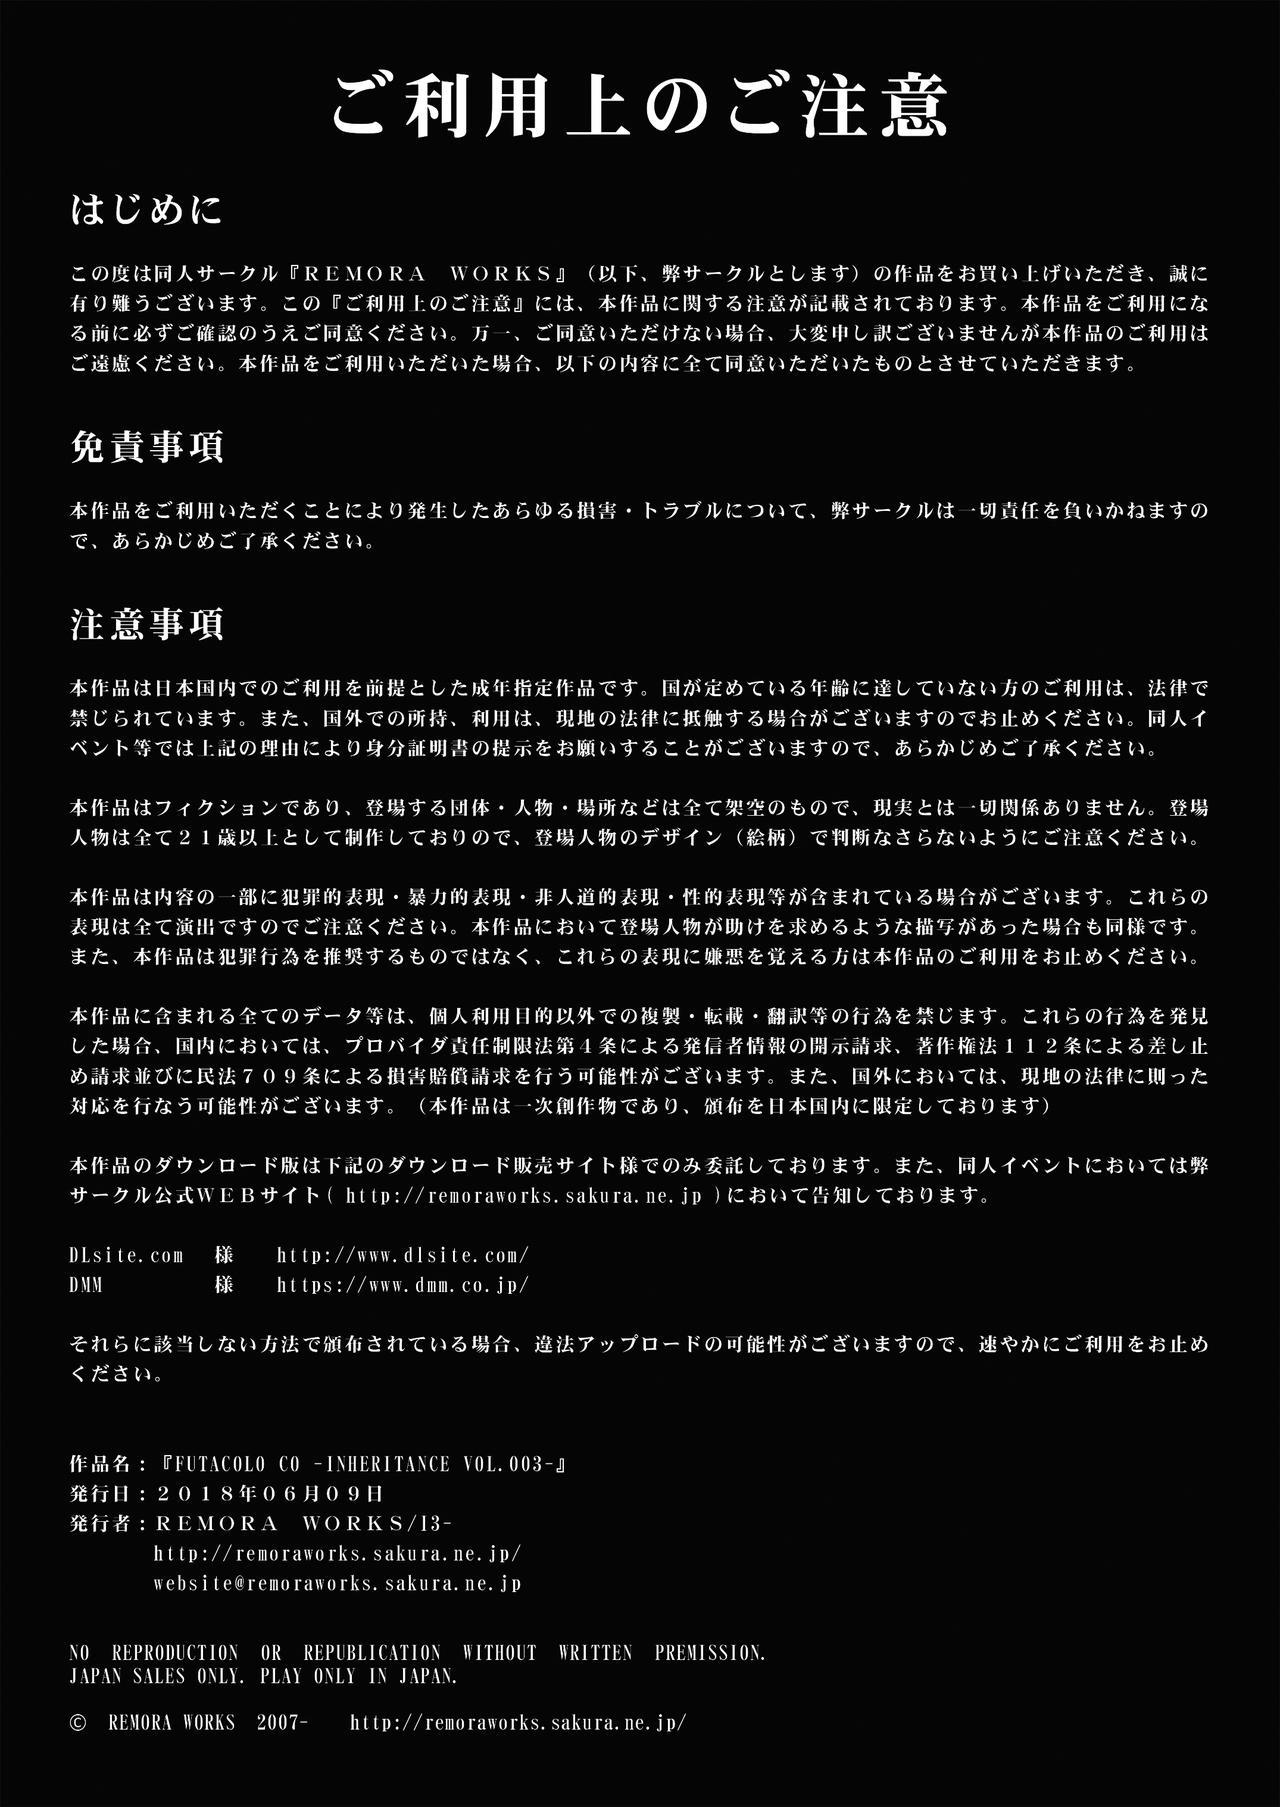 [Remora Works (isaki)] FUTACOLO CO -INHERITANCE- VOL. 003 [English] [Digital] {Hennojin} 2